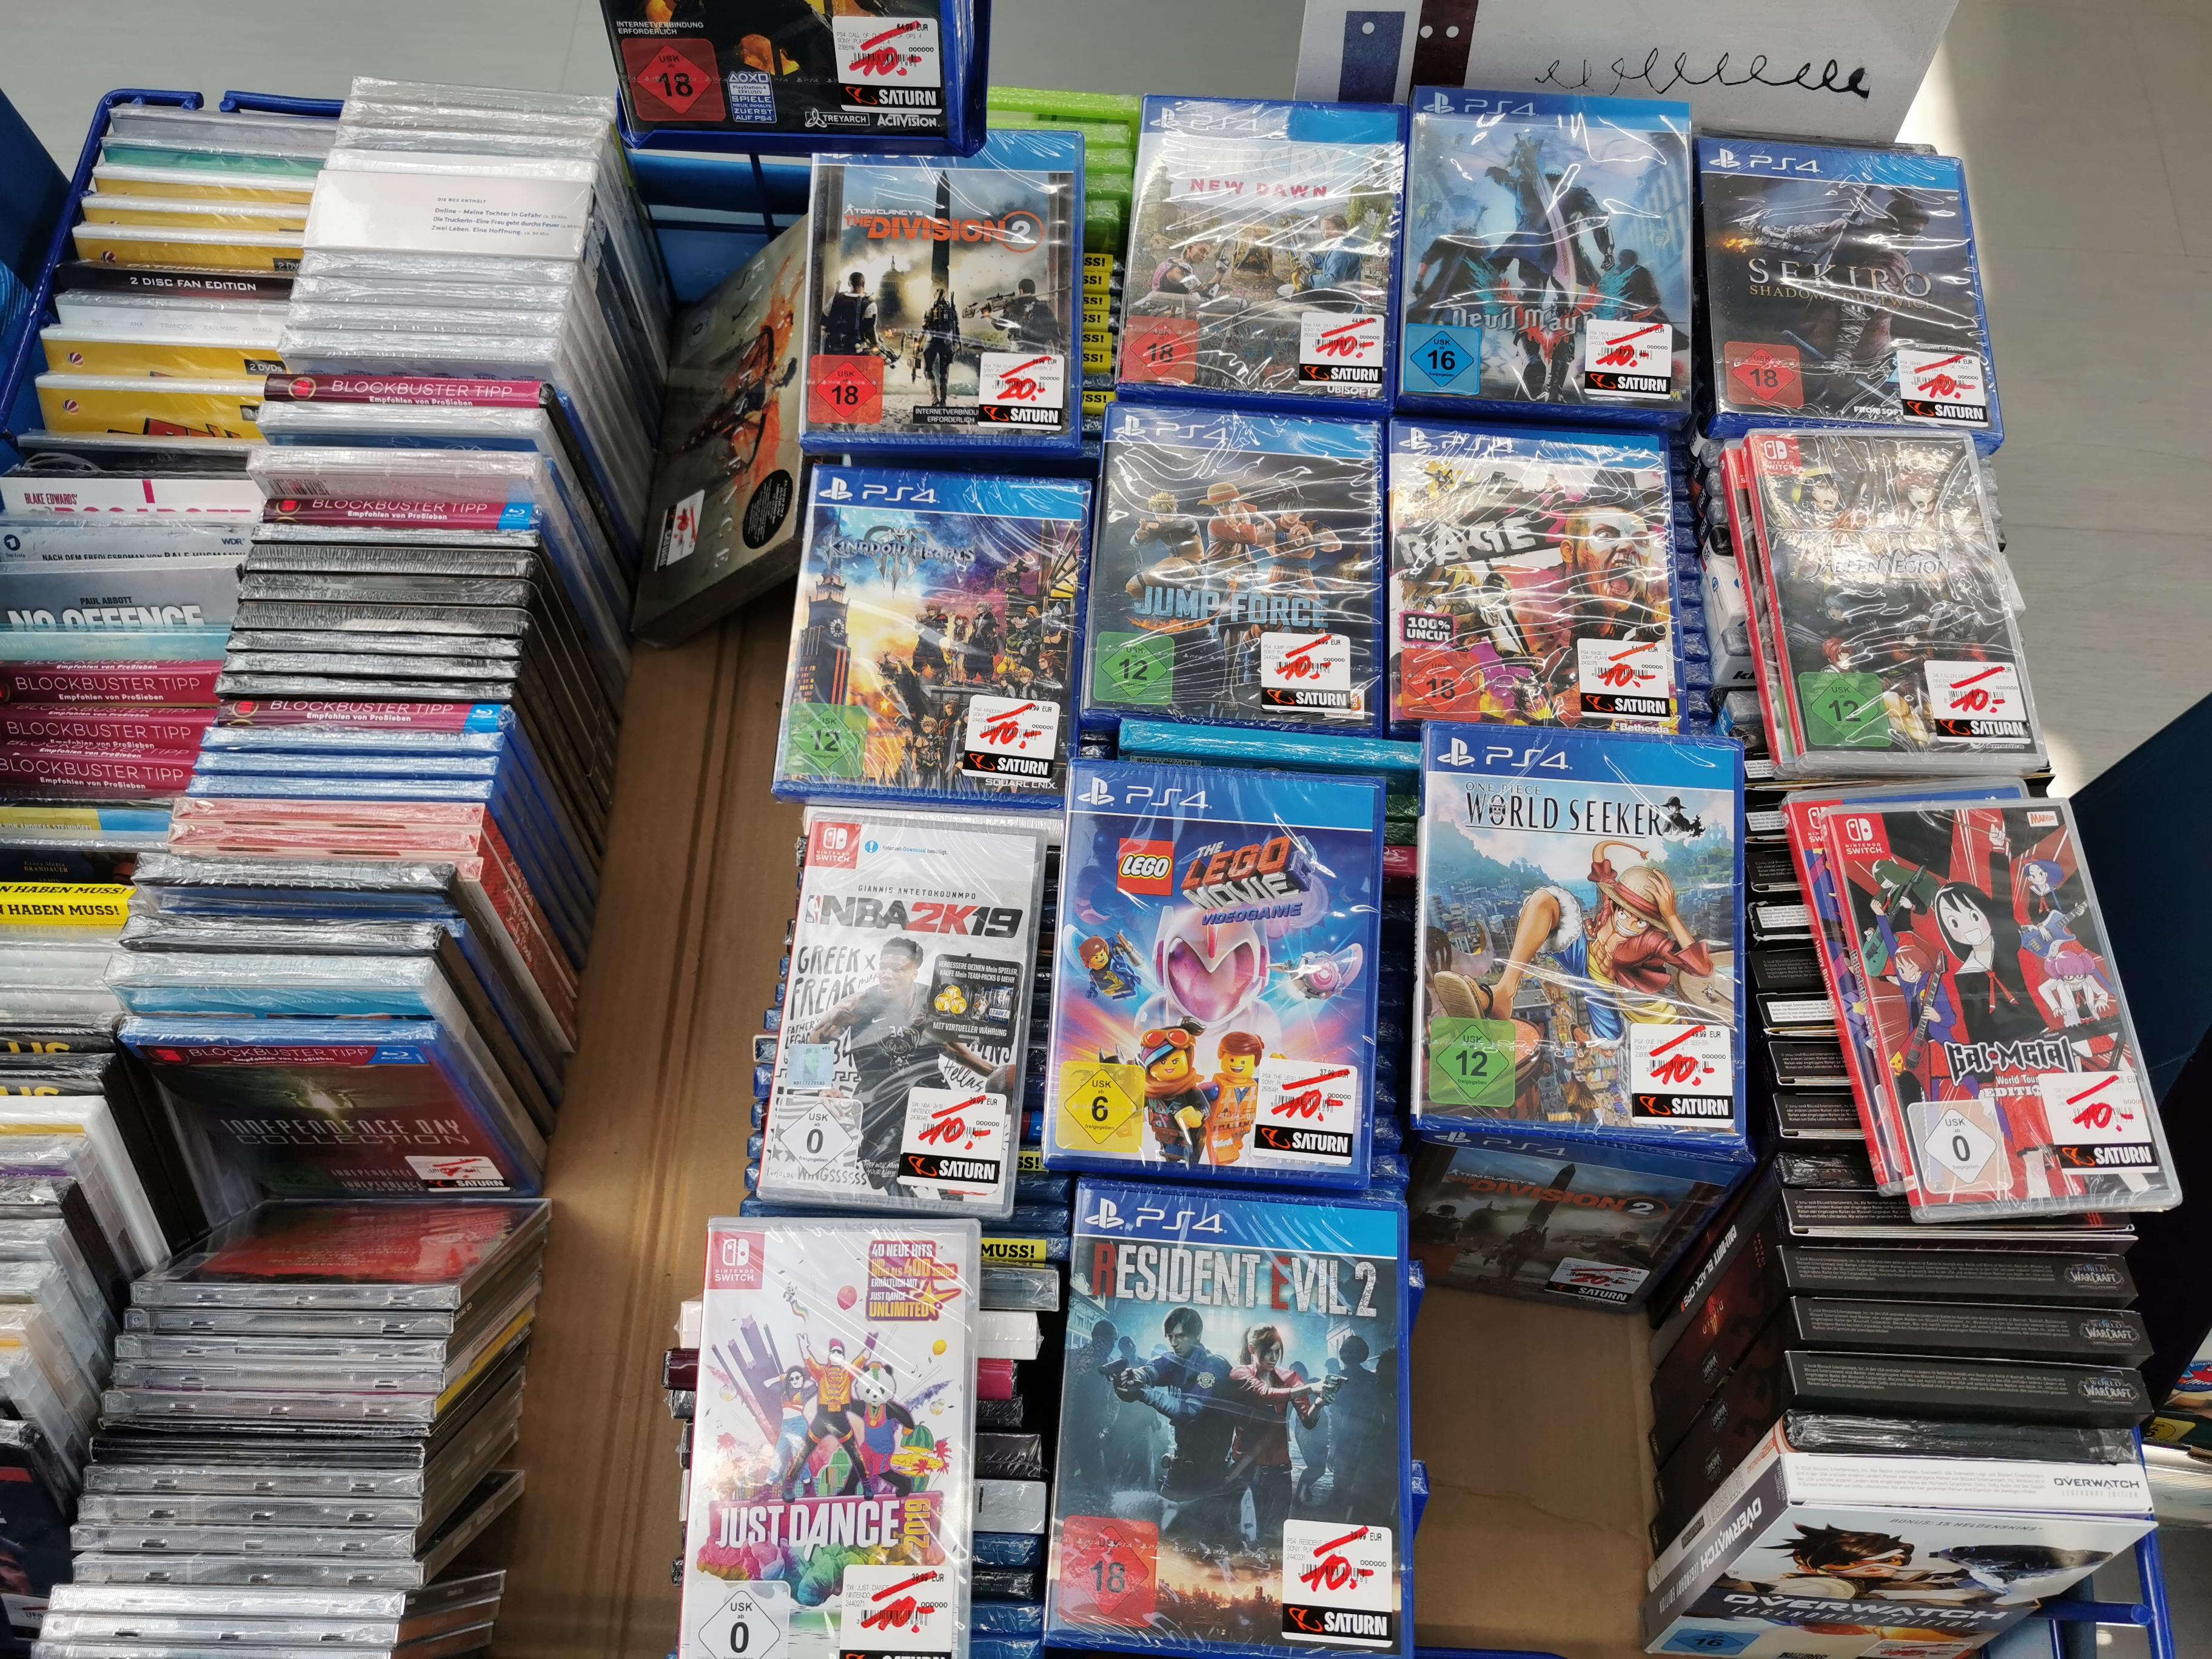 [Lokal] Saturn Kempten - Sekiro, Devil May Cry 5, Rage 2, Resident Evil 2 u.v.a. 10,-EUR